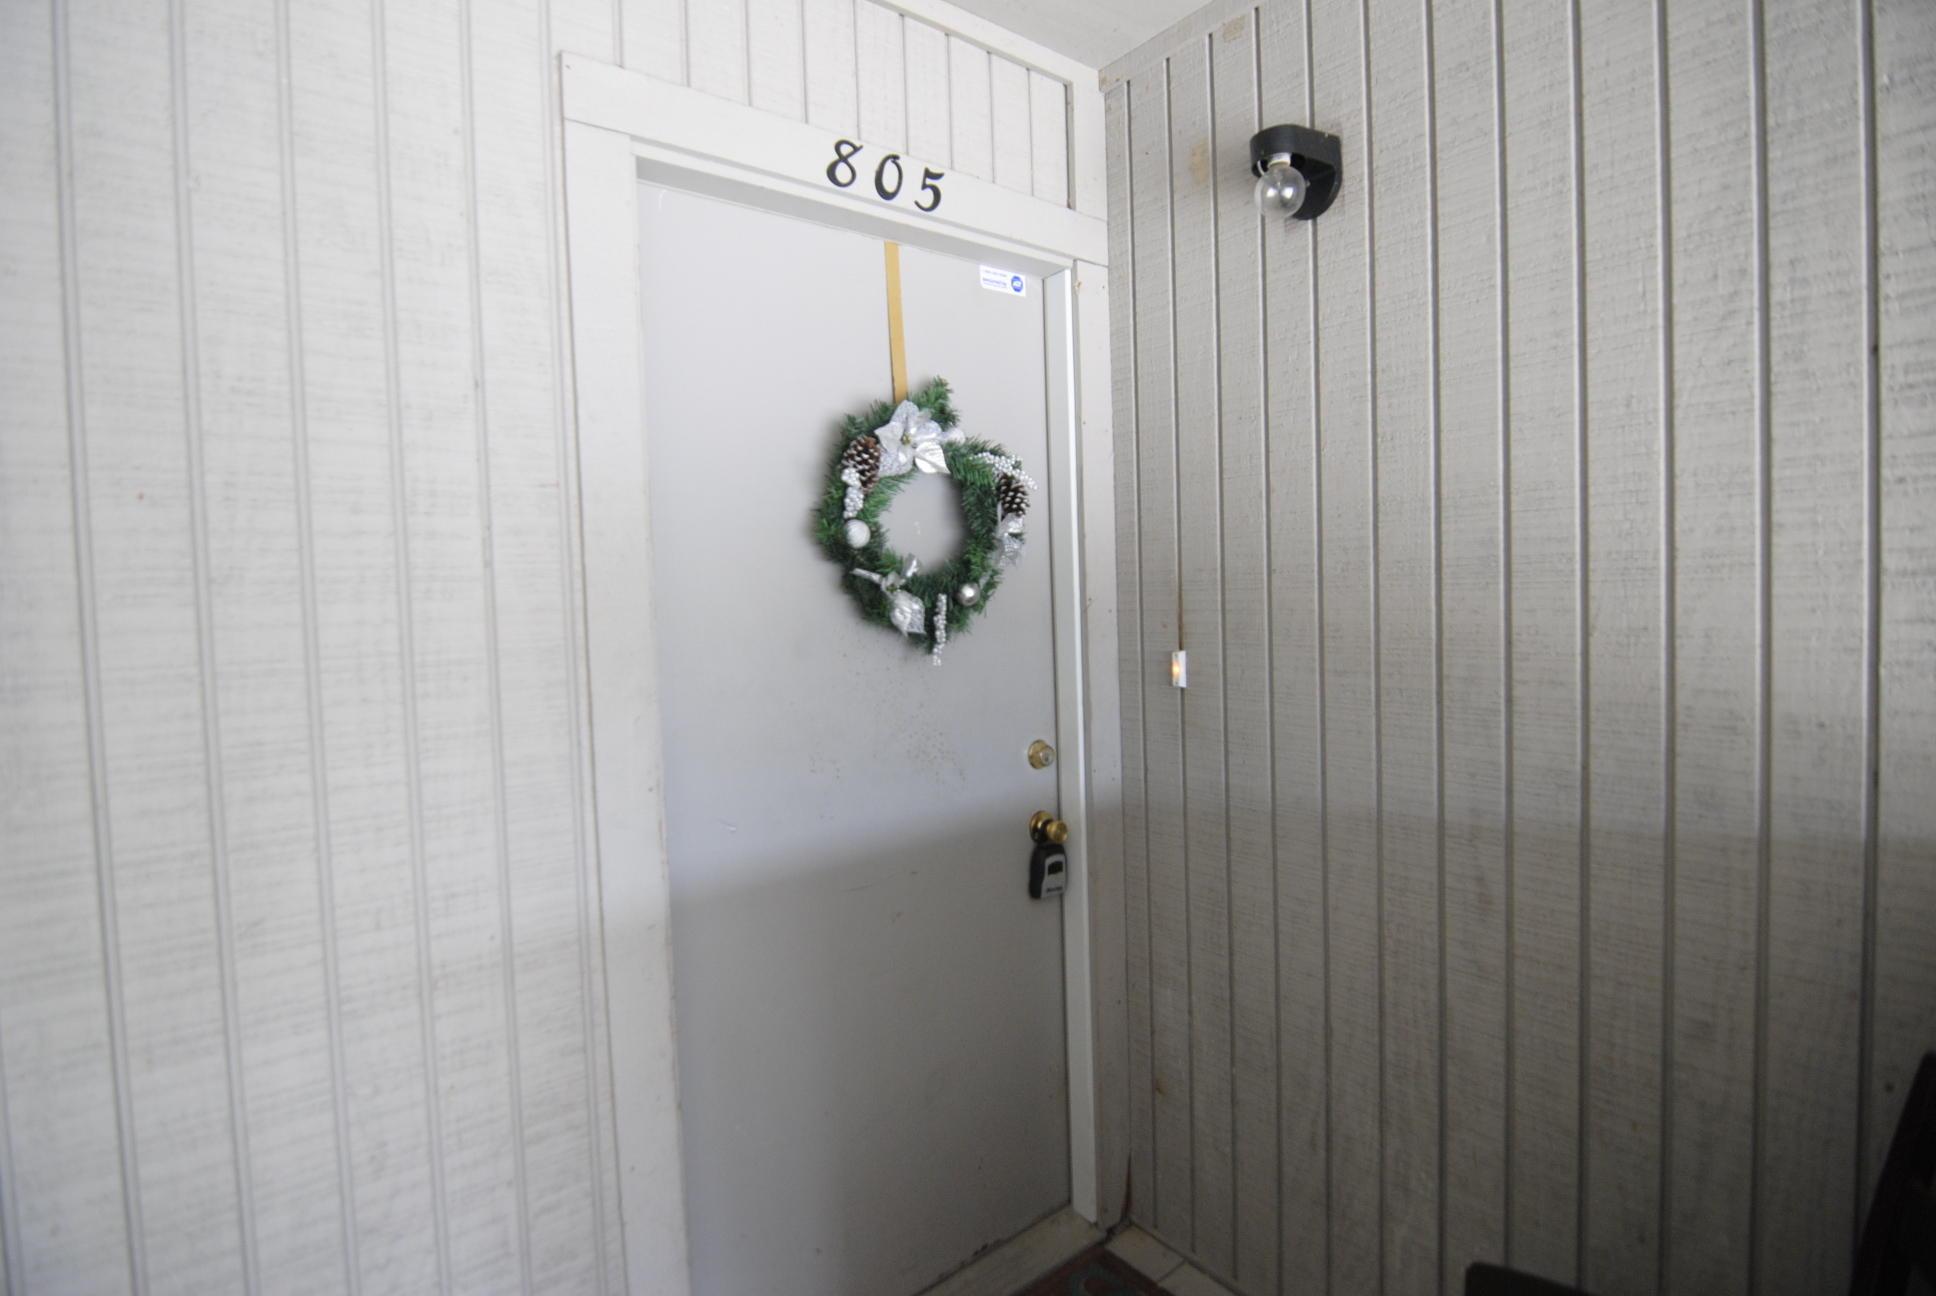 805 Greenmeadow Drive Goose Creek, SC 29445